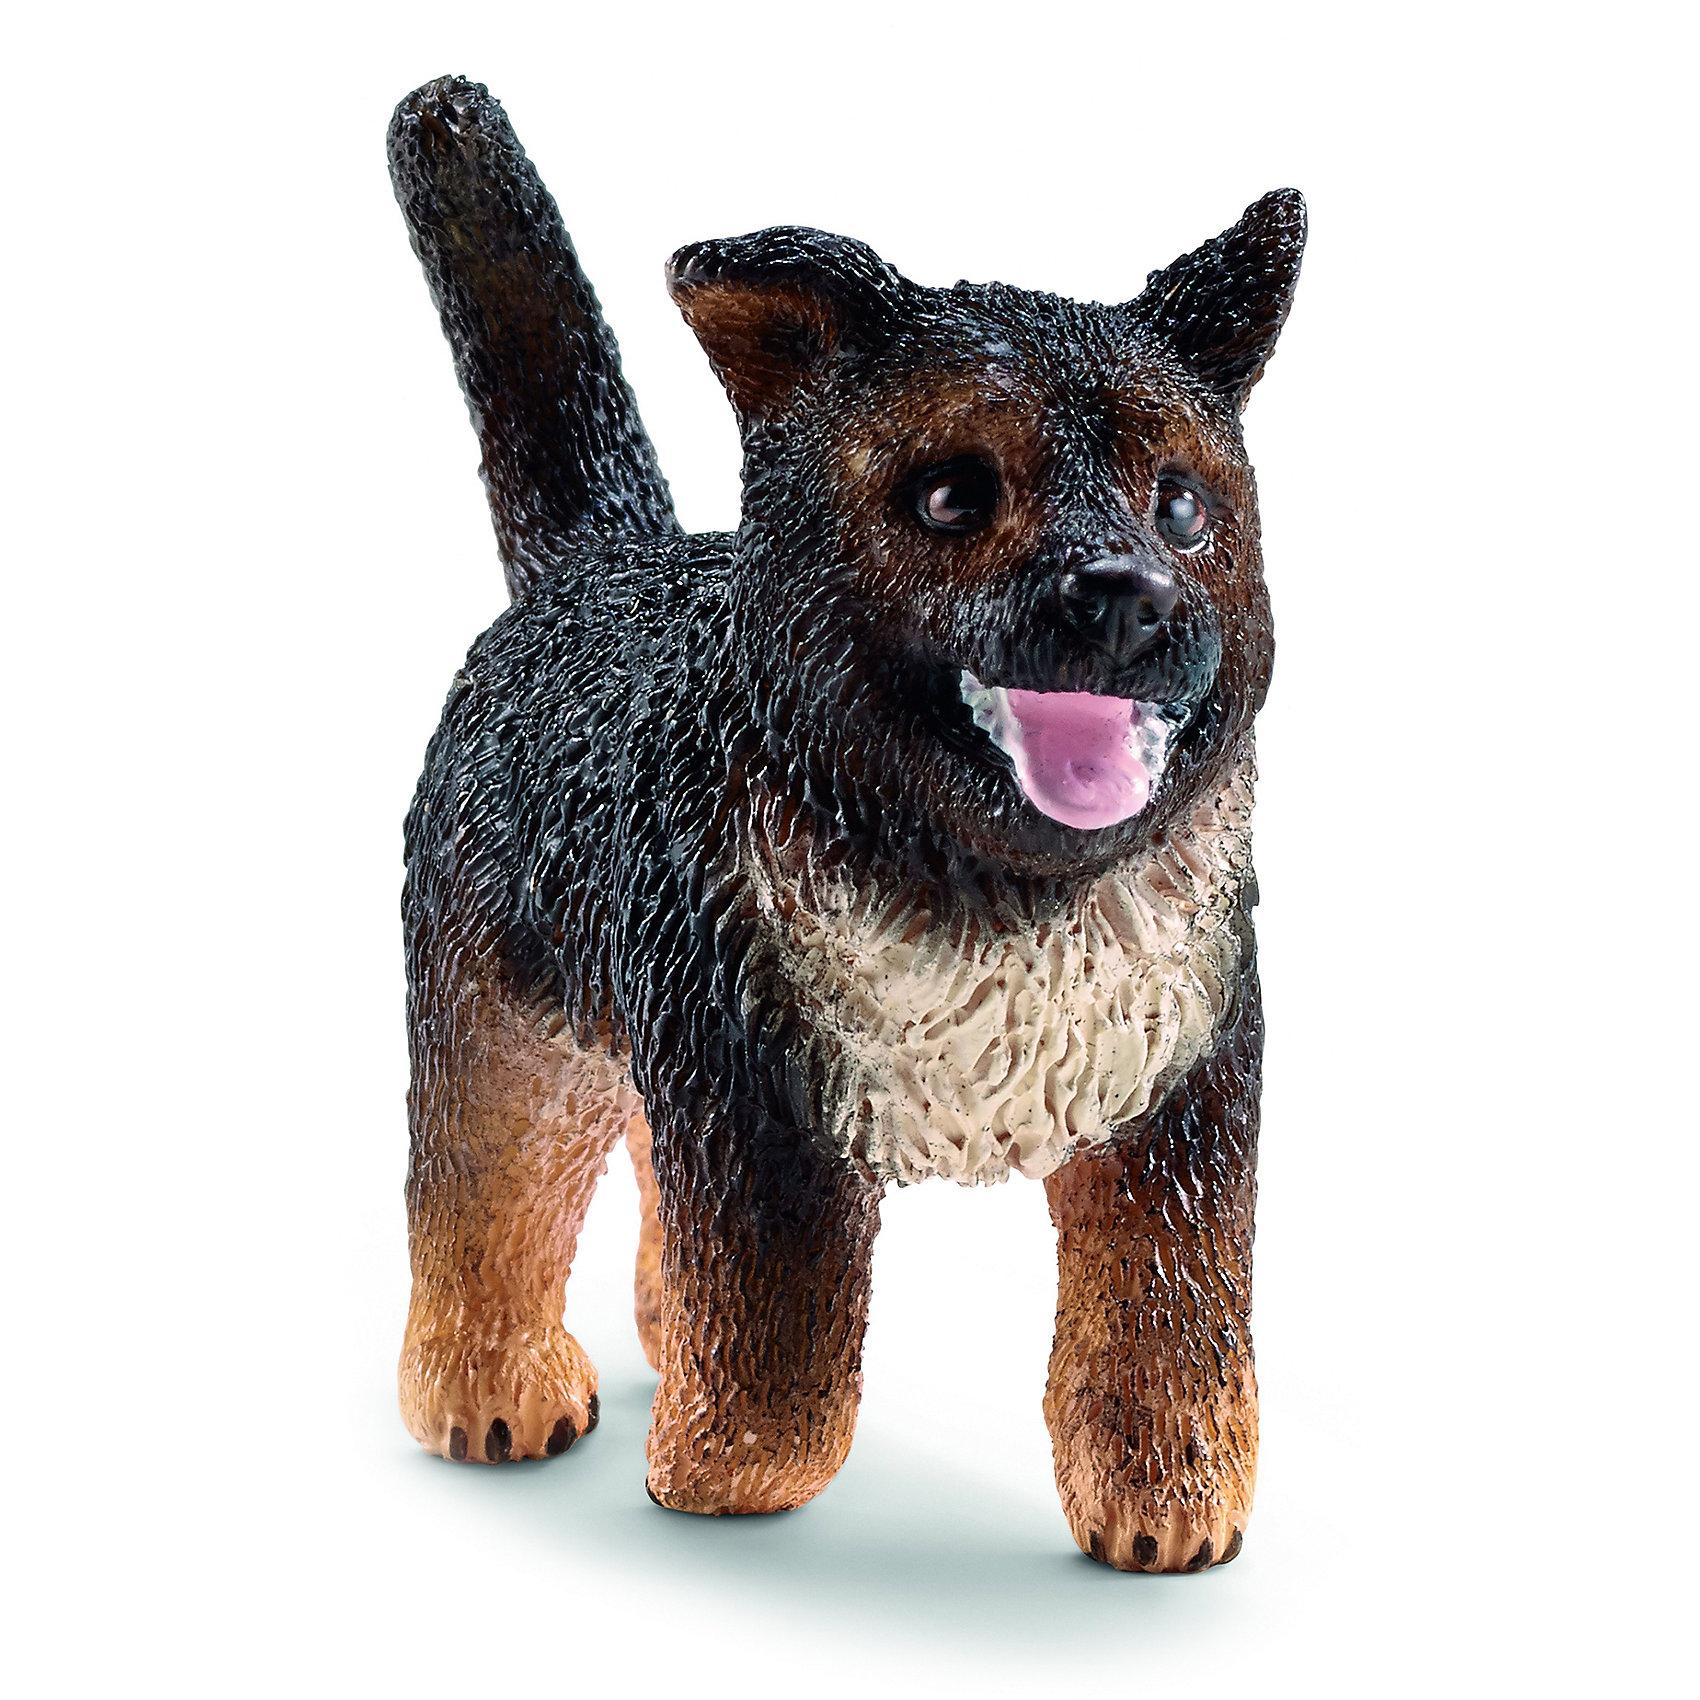 Schleich Немецкая овчарка щенок, Schleich фигурки игрушки schleich немецкая овчарка